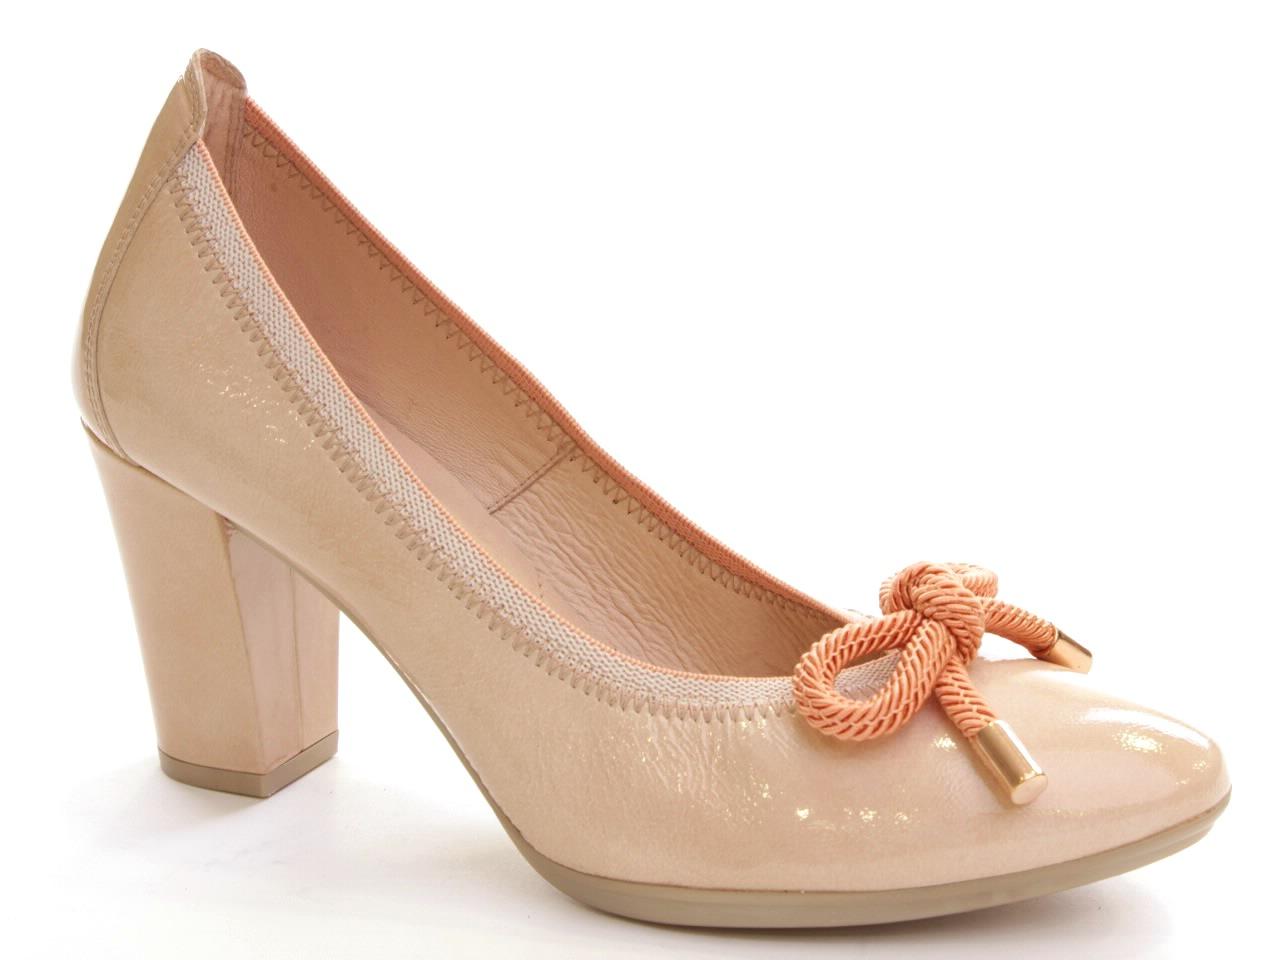 Sapatos de Salto Hispanitas - 165 HV51240